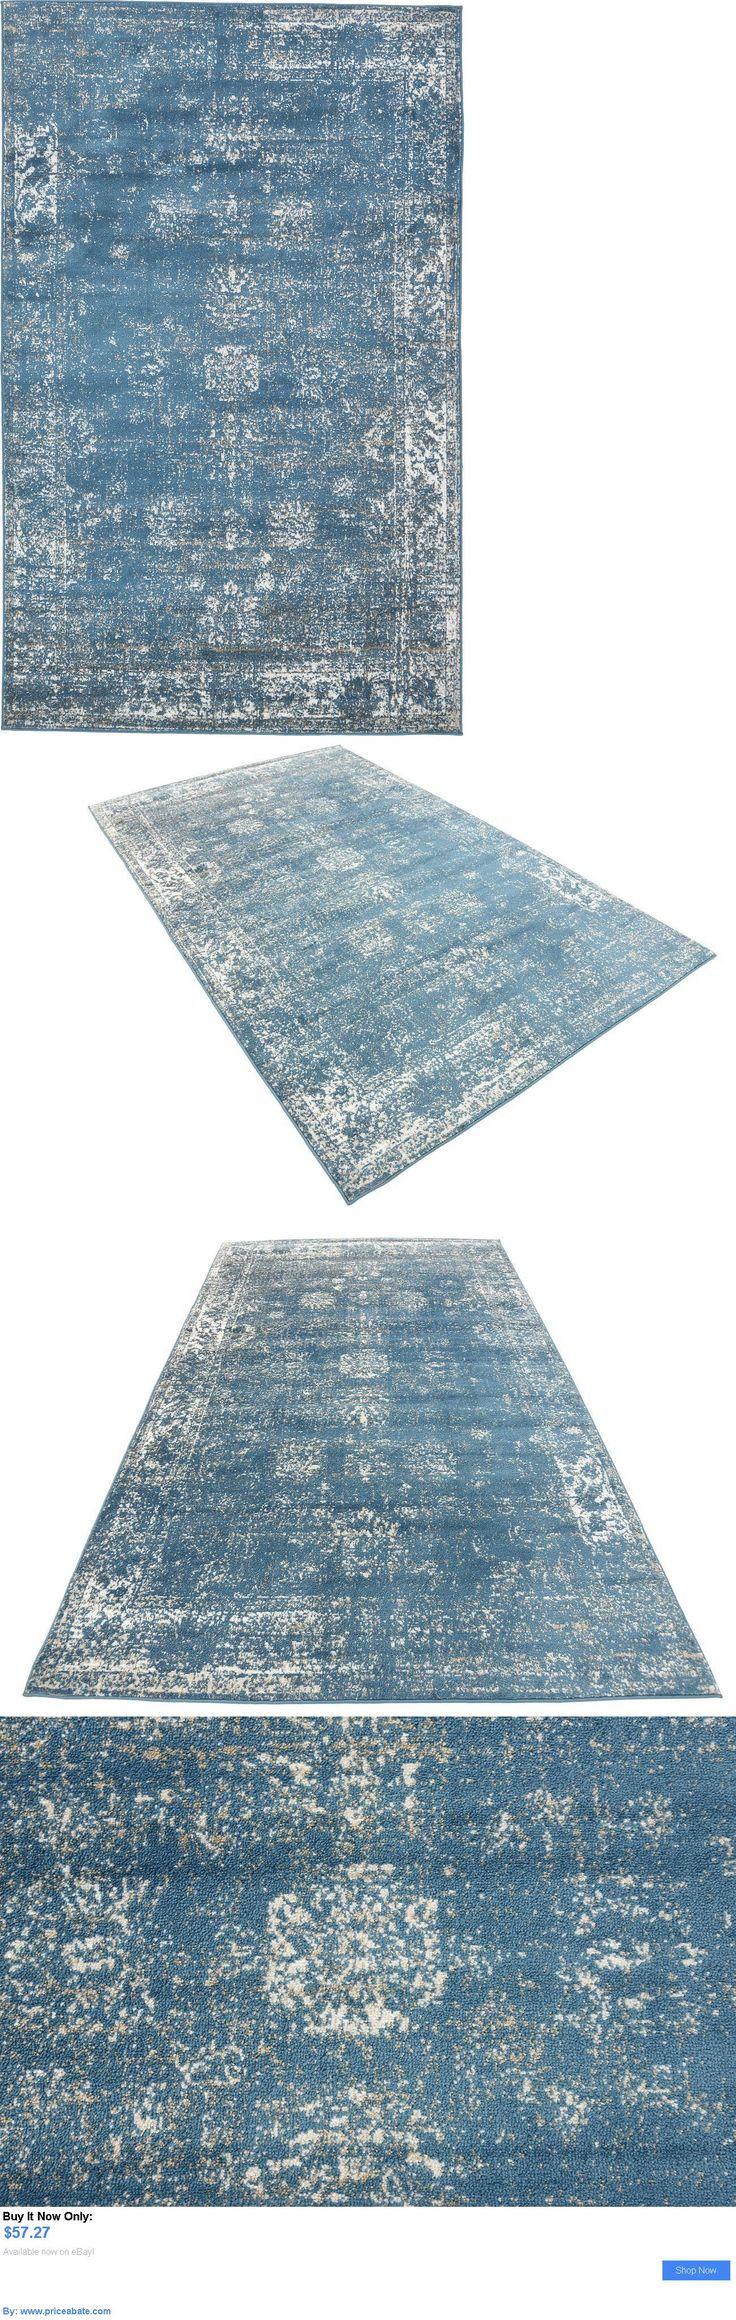 best  contemporary carpet ideas on pinterest  contemporary  - household items modern monaco rug floor area rugs contemporary carpet newblue modern carpets buy